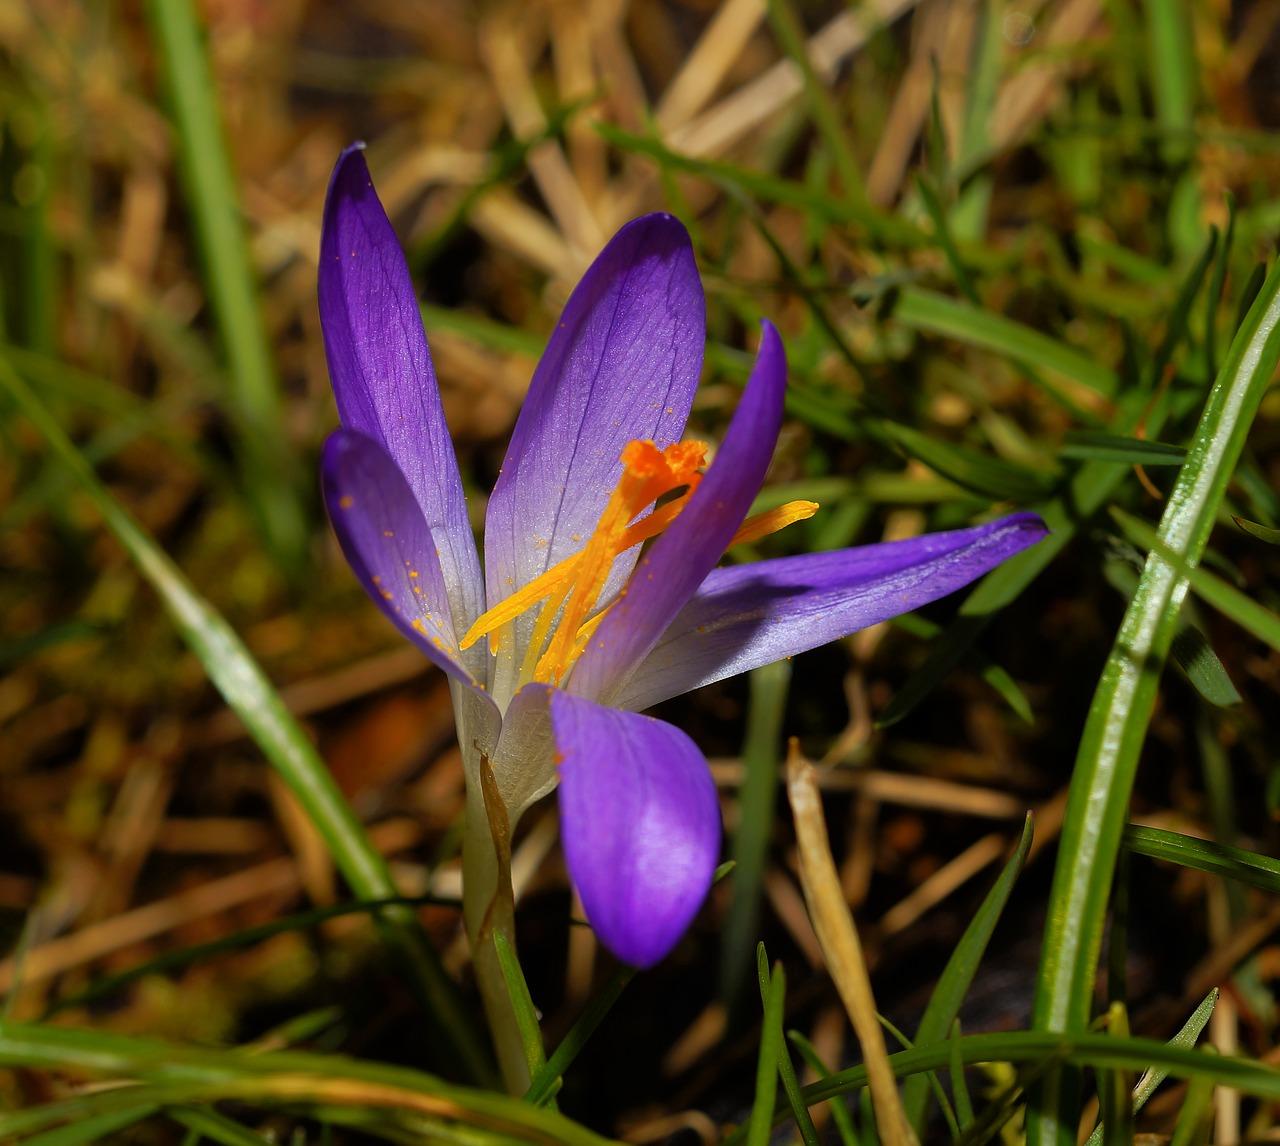 Flowerblossombloomcrocusearly Spring Free Photo From Needpix